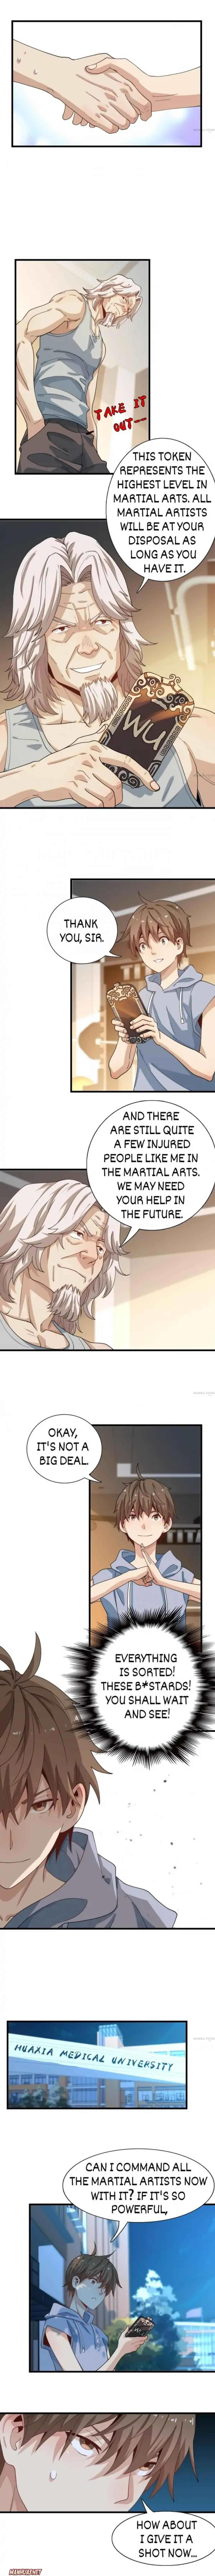 Rebirth Of Legendary Doctor Chapter 51 page 2 - Mangakakalots.com